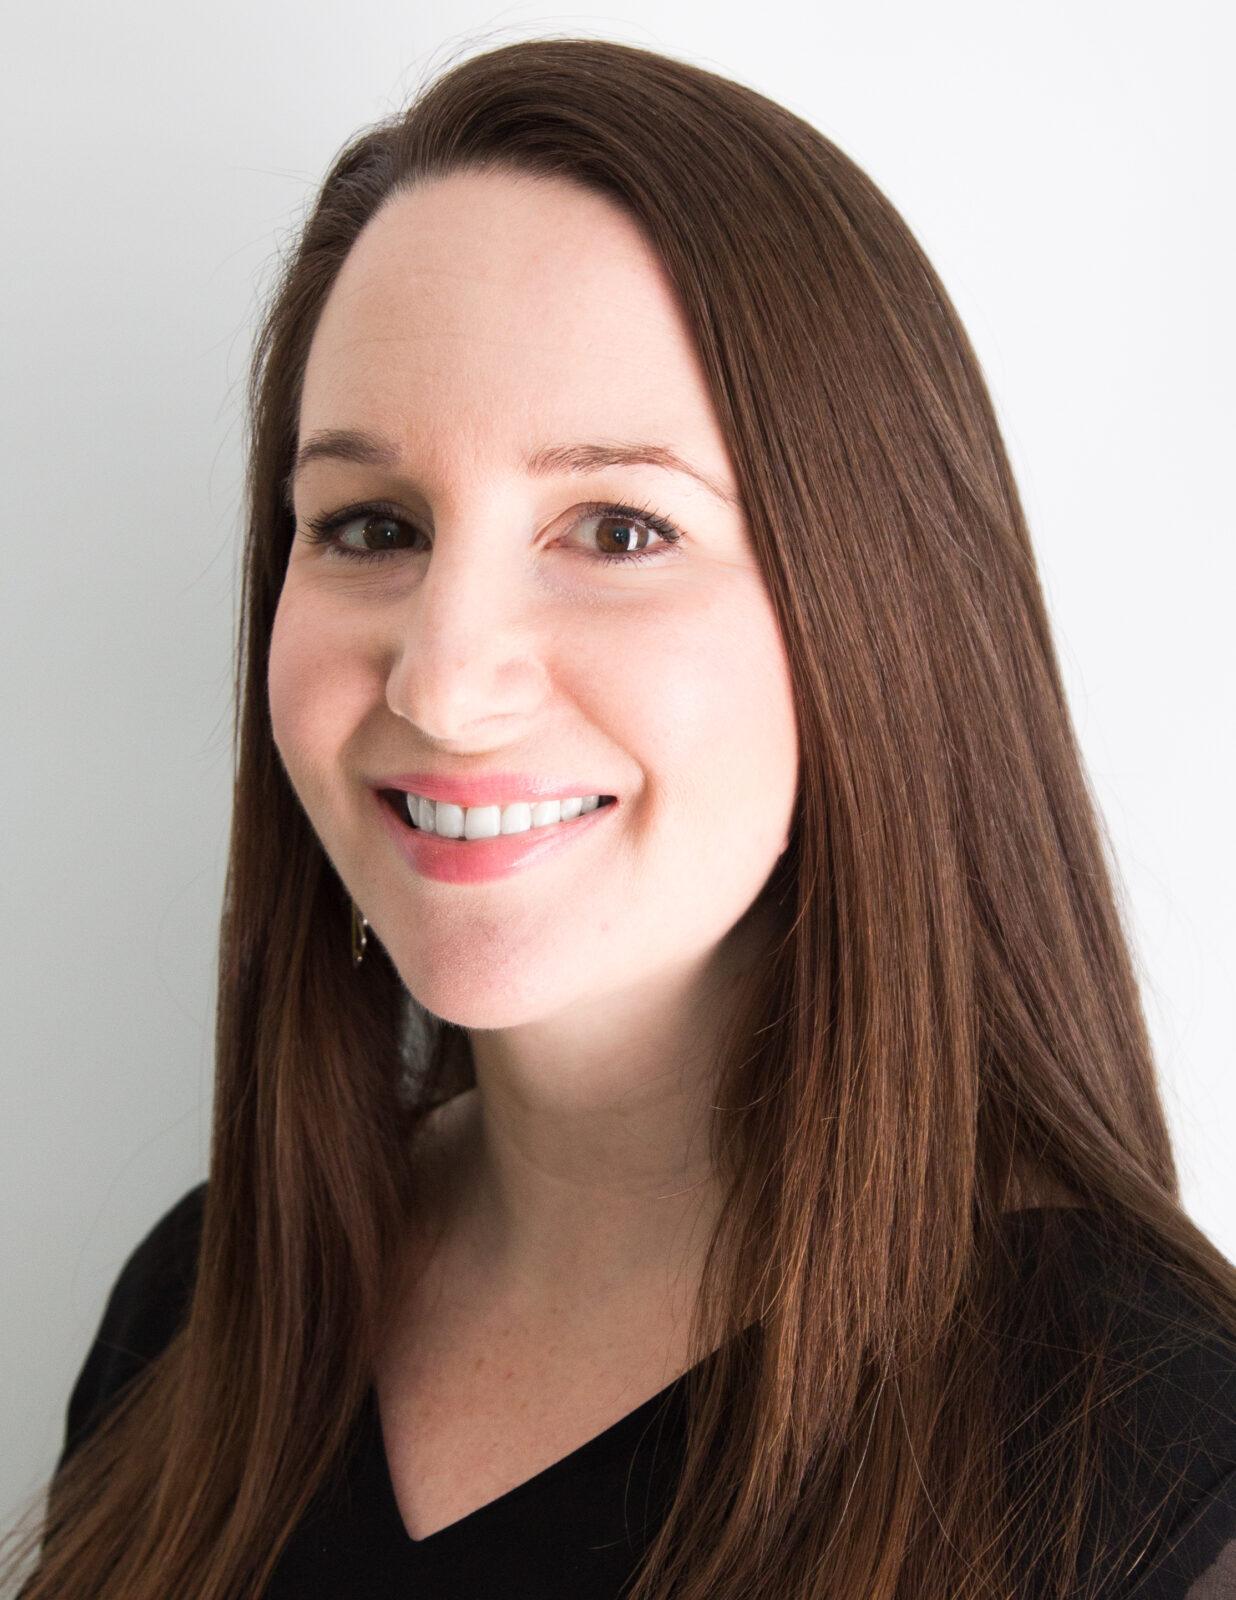 08 - Amy McLaughlin - Marketing Coordinator